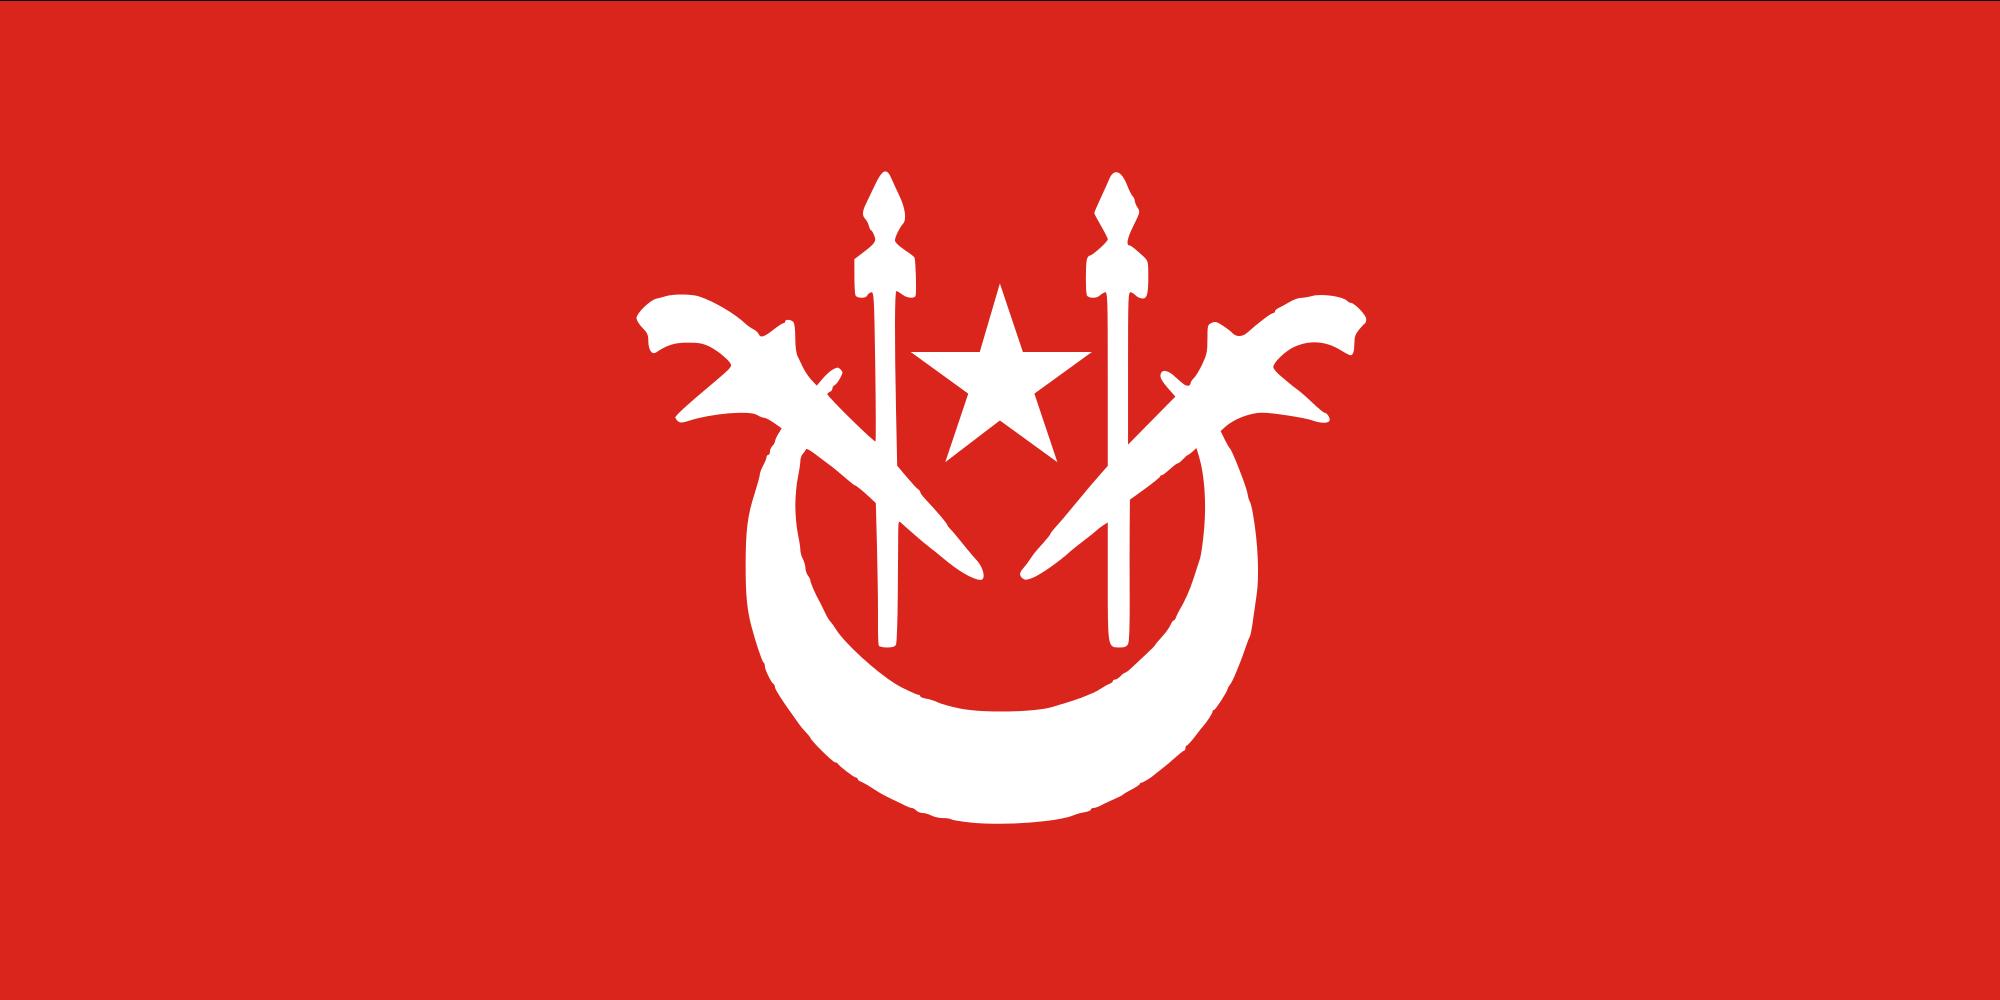 Kelantan | Kelantan, Flag, Coat of arms